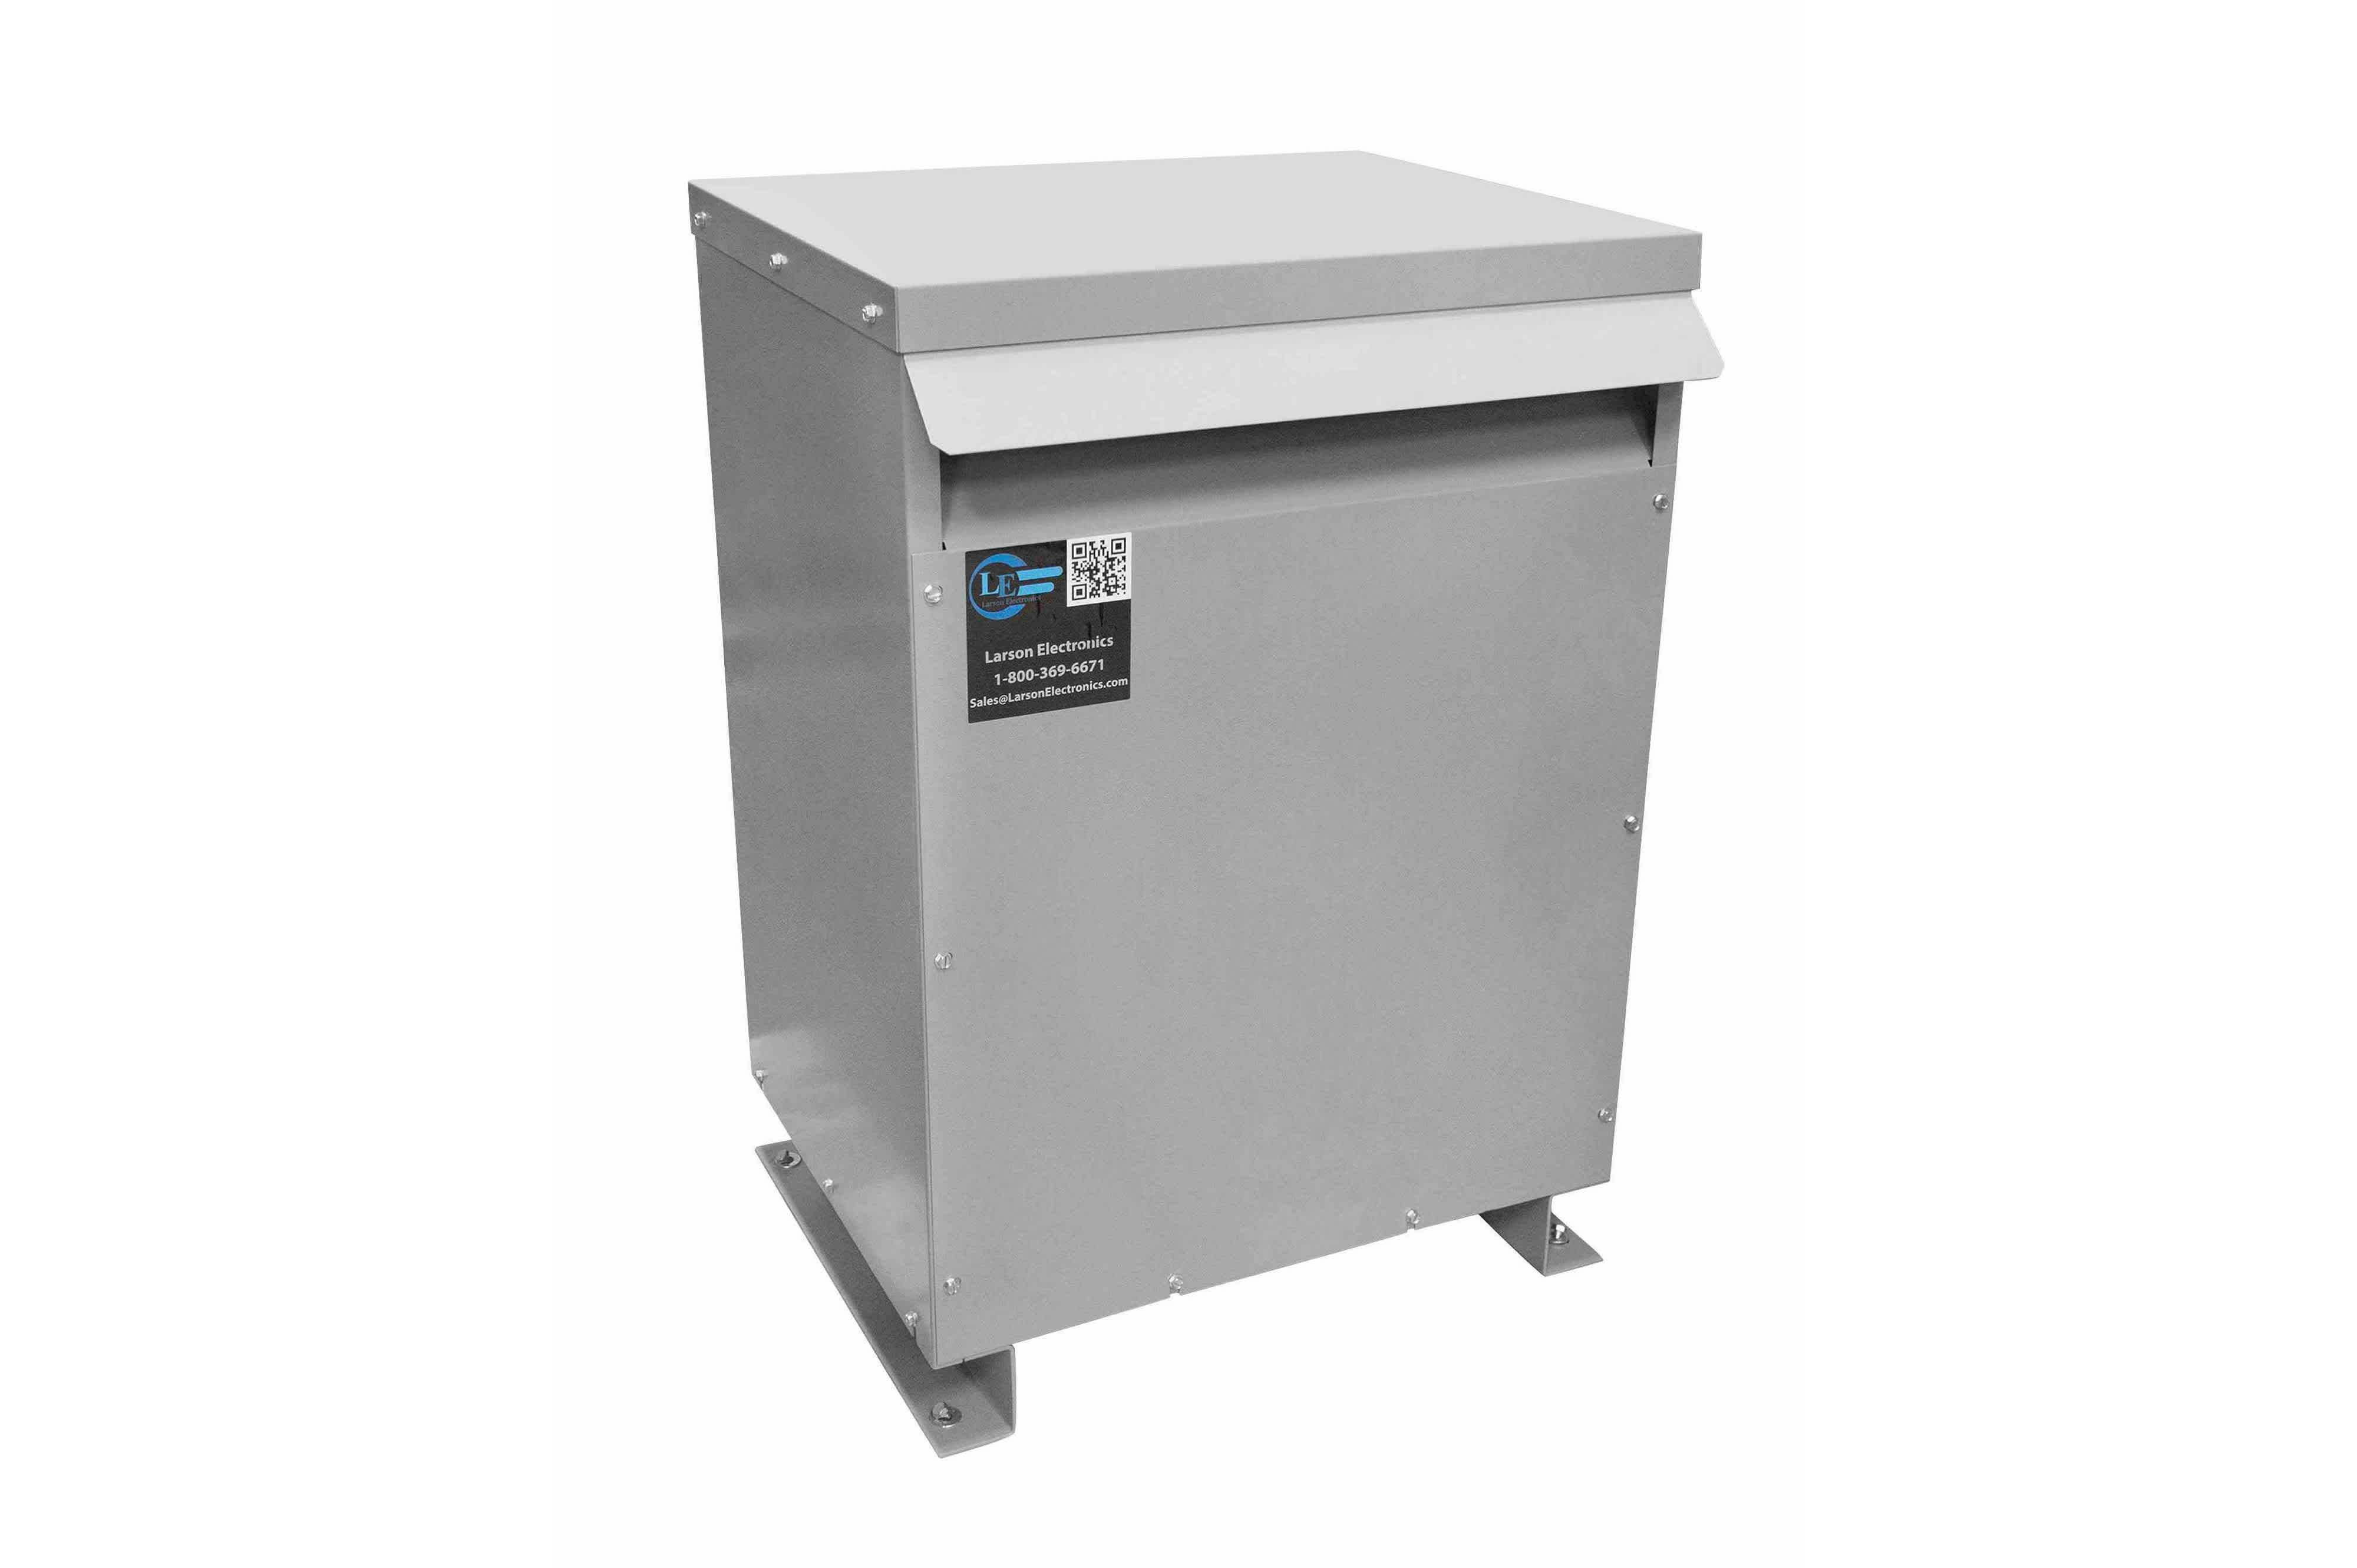 18 kVA 3PH Isolation Transformer, 240V Wye Primary, 380Y/220 Wye-N Secondary, N3R, Ventilated, 60 Hz